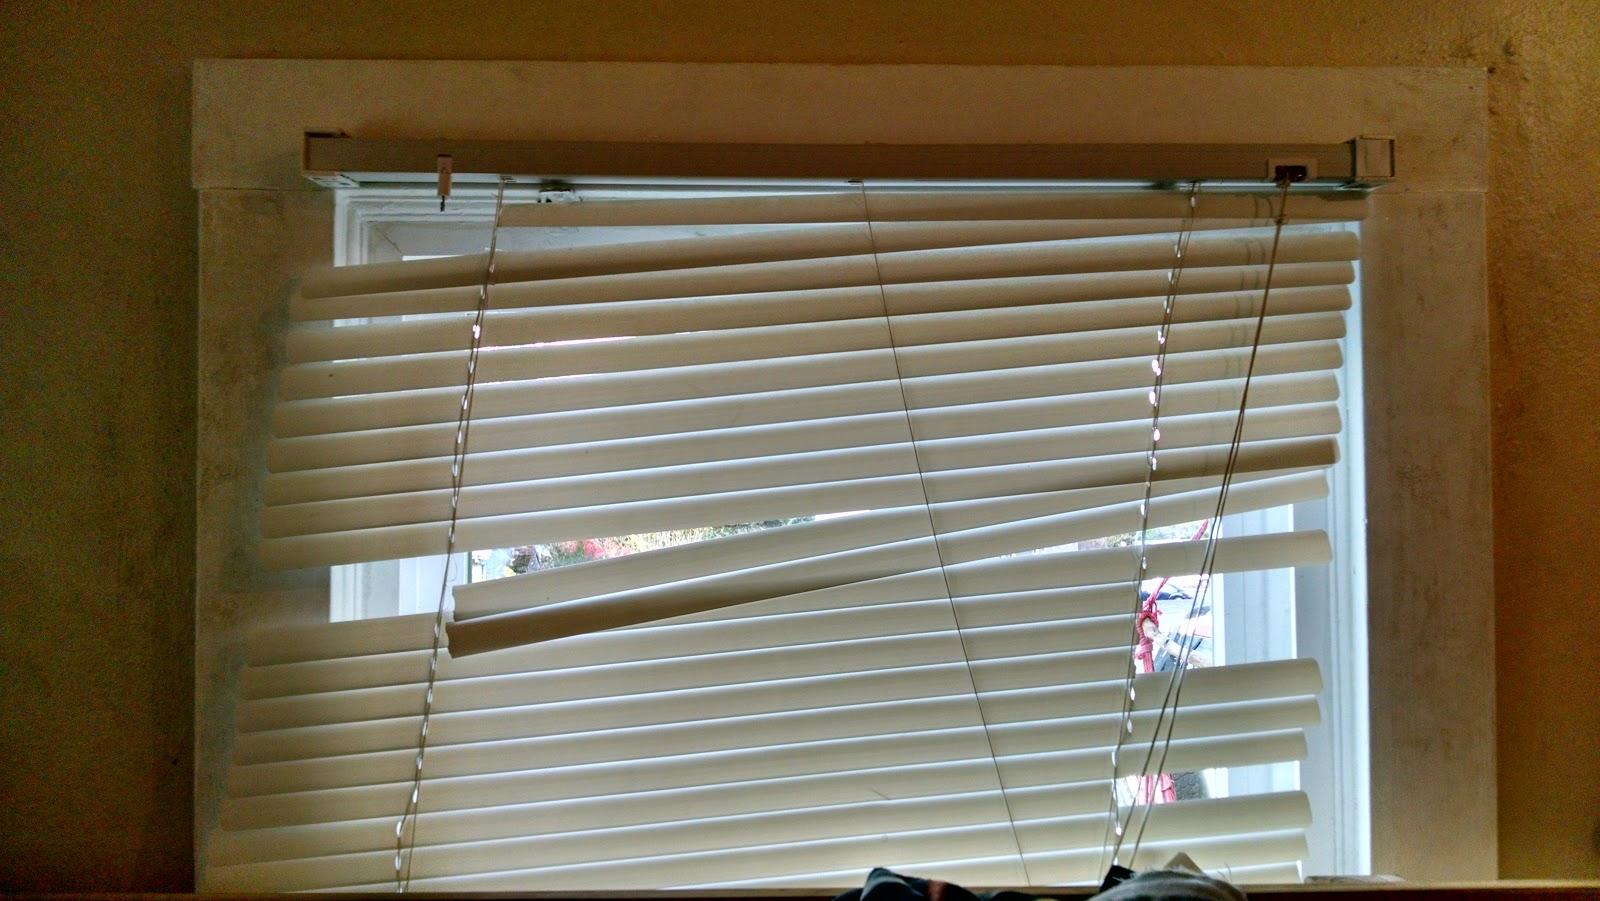 to roman o blog design diy no adding sew grosgrain clock trim blinds border black bordered ribbon shade co